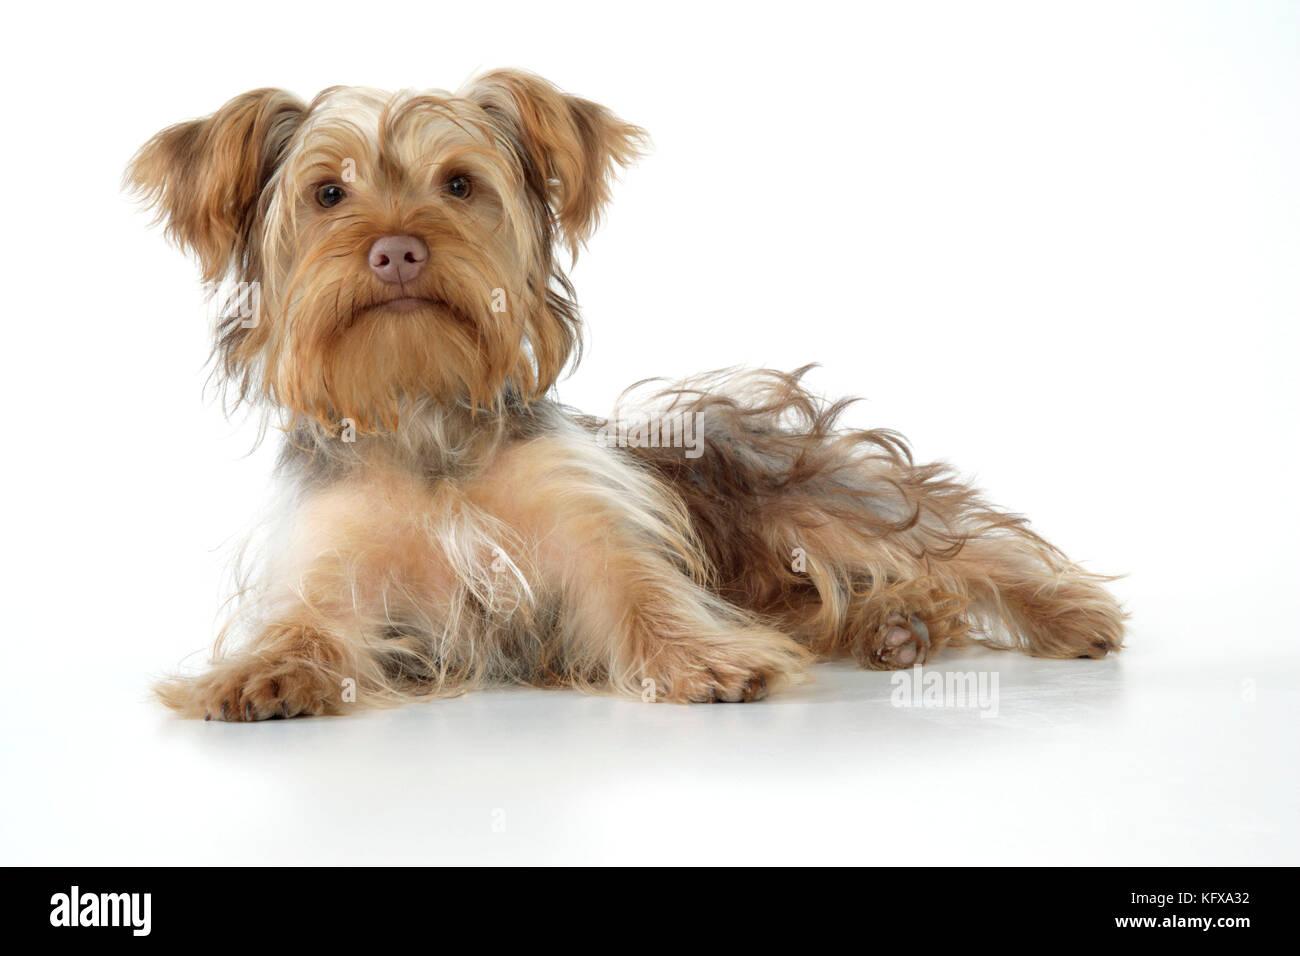 Dog Poodle X Yorkie Yoodle Or Yorkie Poo Cross Breed Of